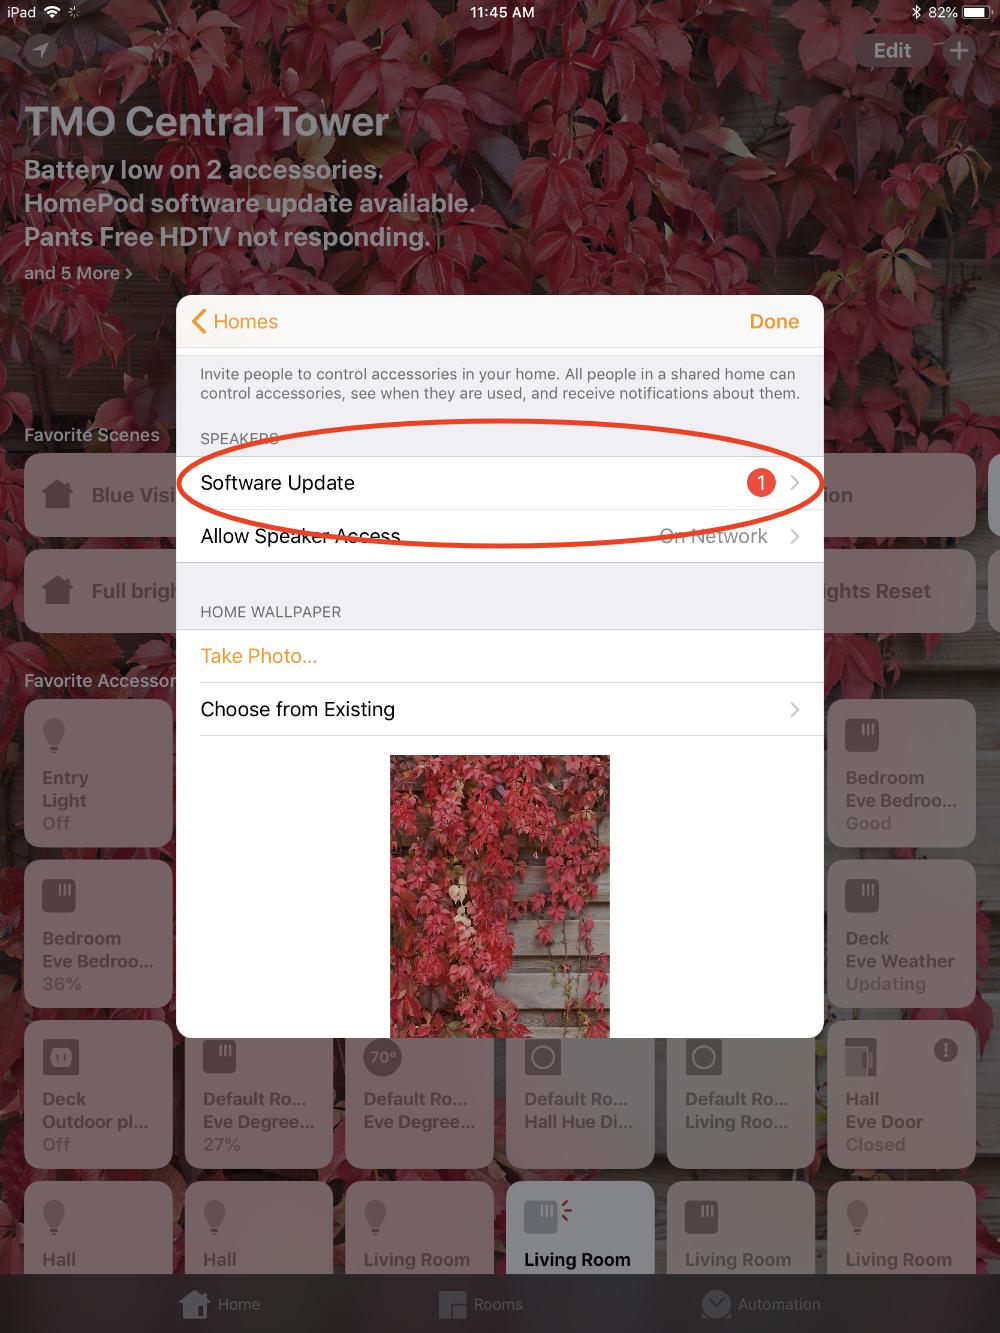 HomePod software update alert badge in Home app settings